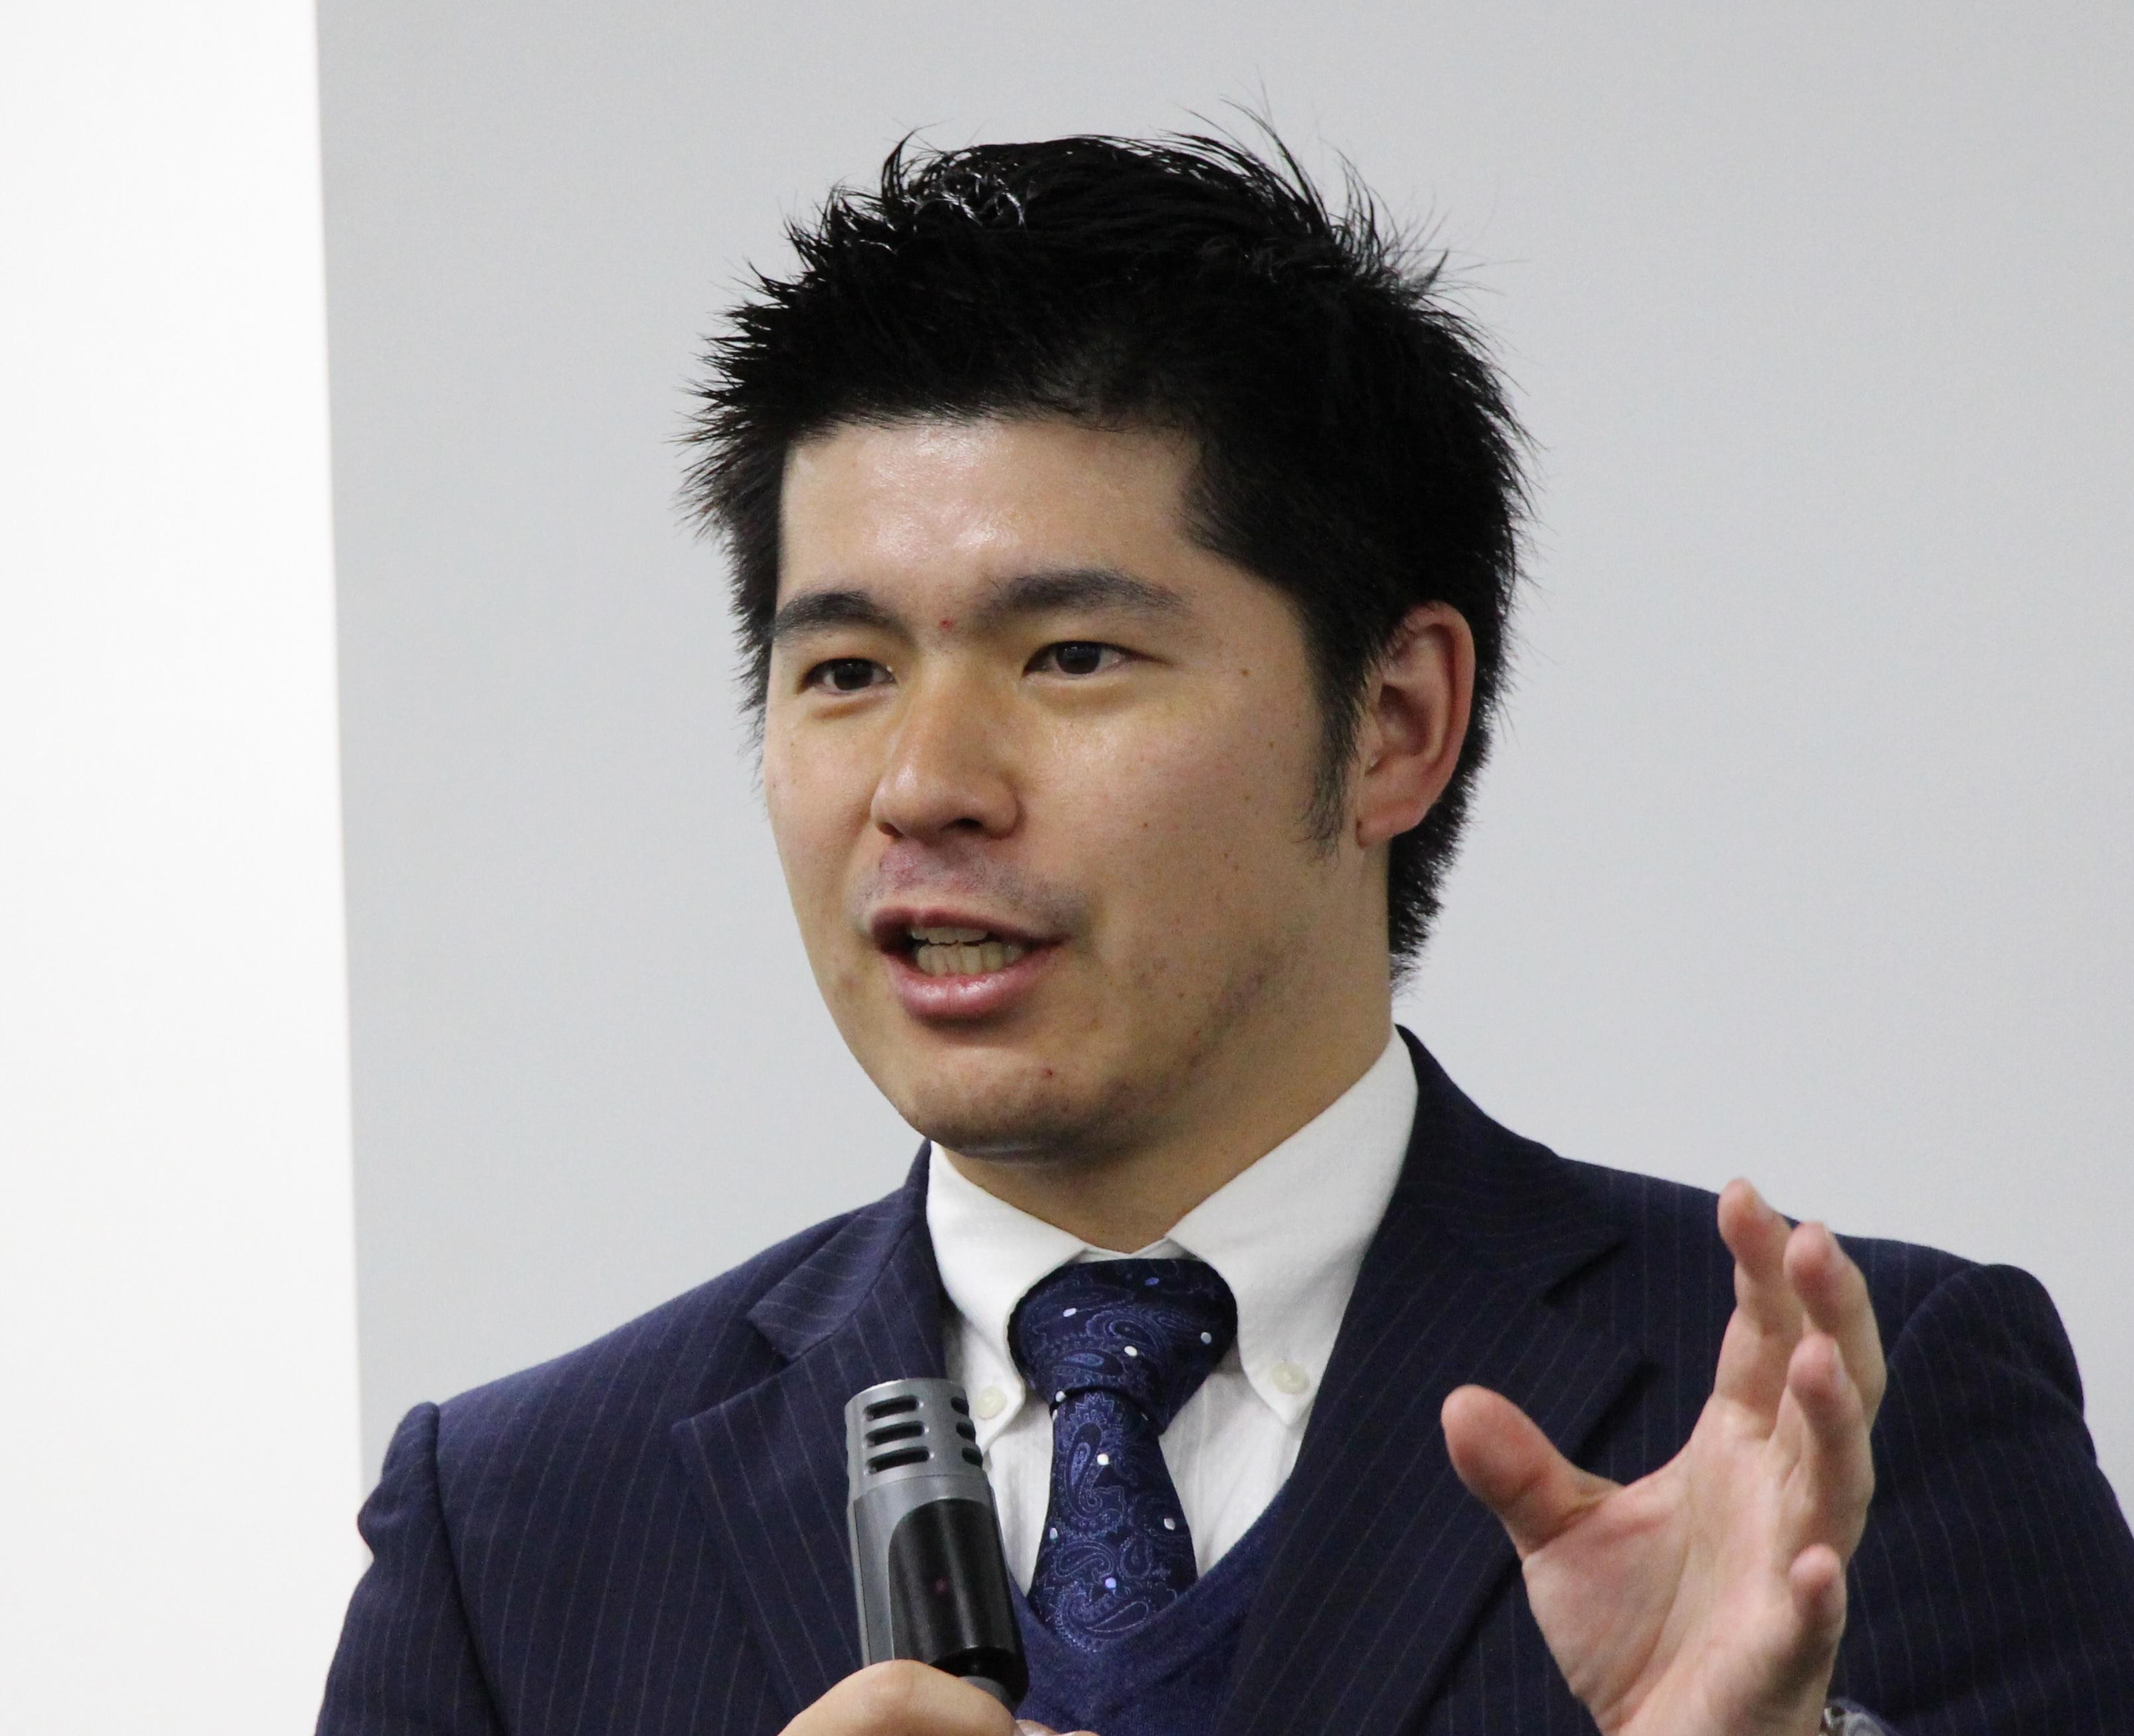 https://www.kaiyodaicareer.com/img/%E7%89%87%E7%80%AC%E3%81%95%E3%82%93.jpg